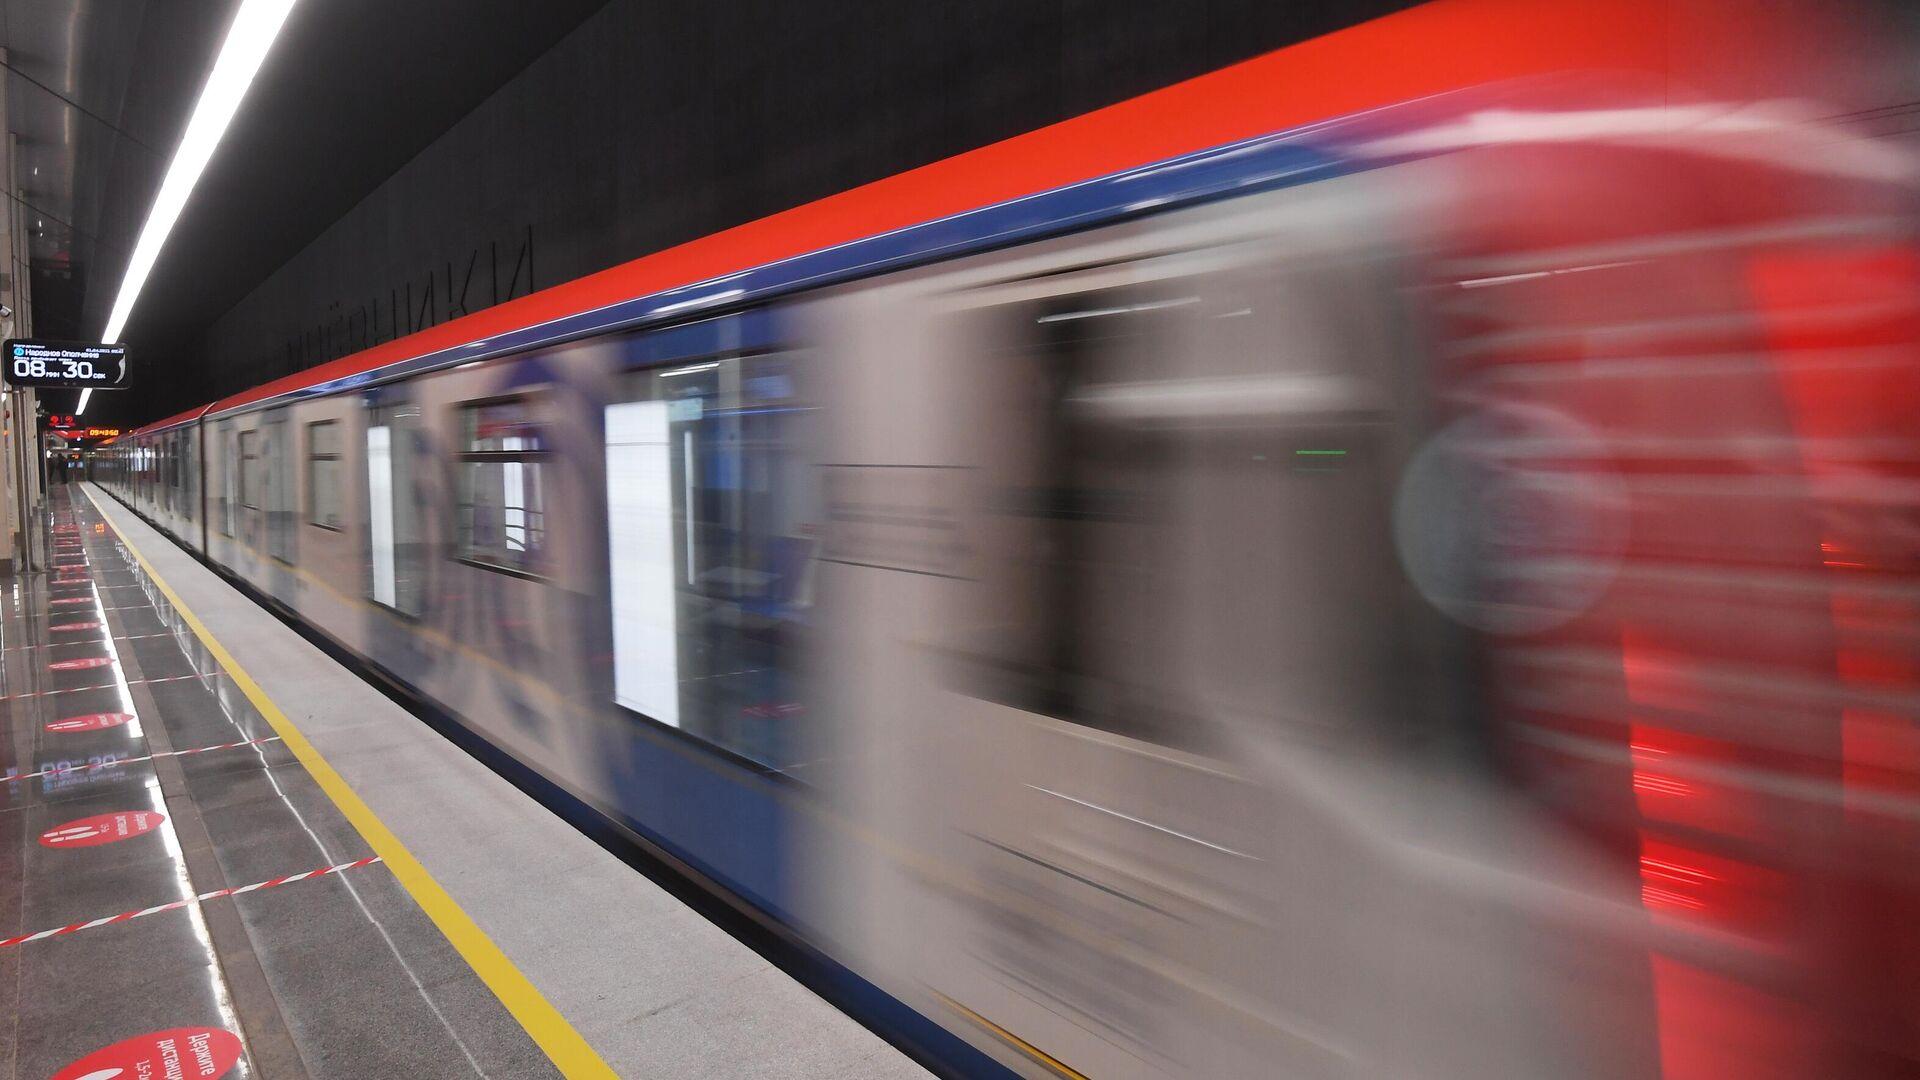 Un tren en el metro de Moscú - Sputnik Mundo, 1920, 08.04.2021